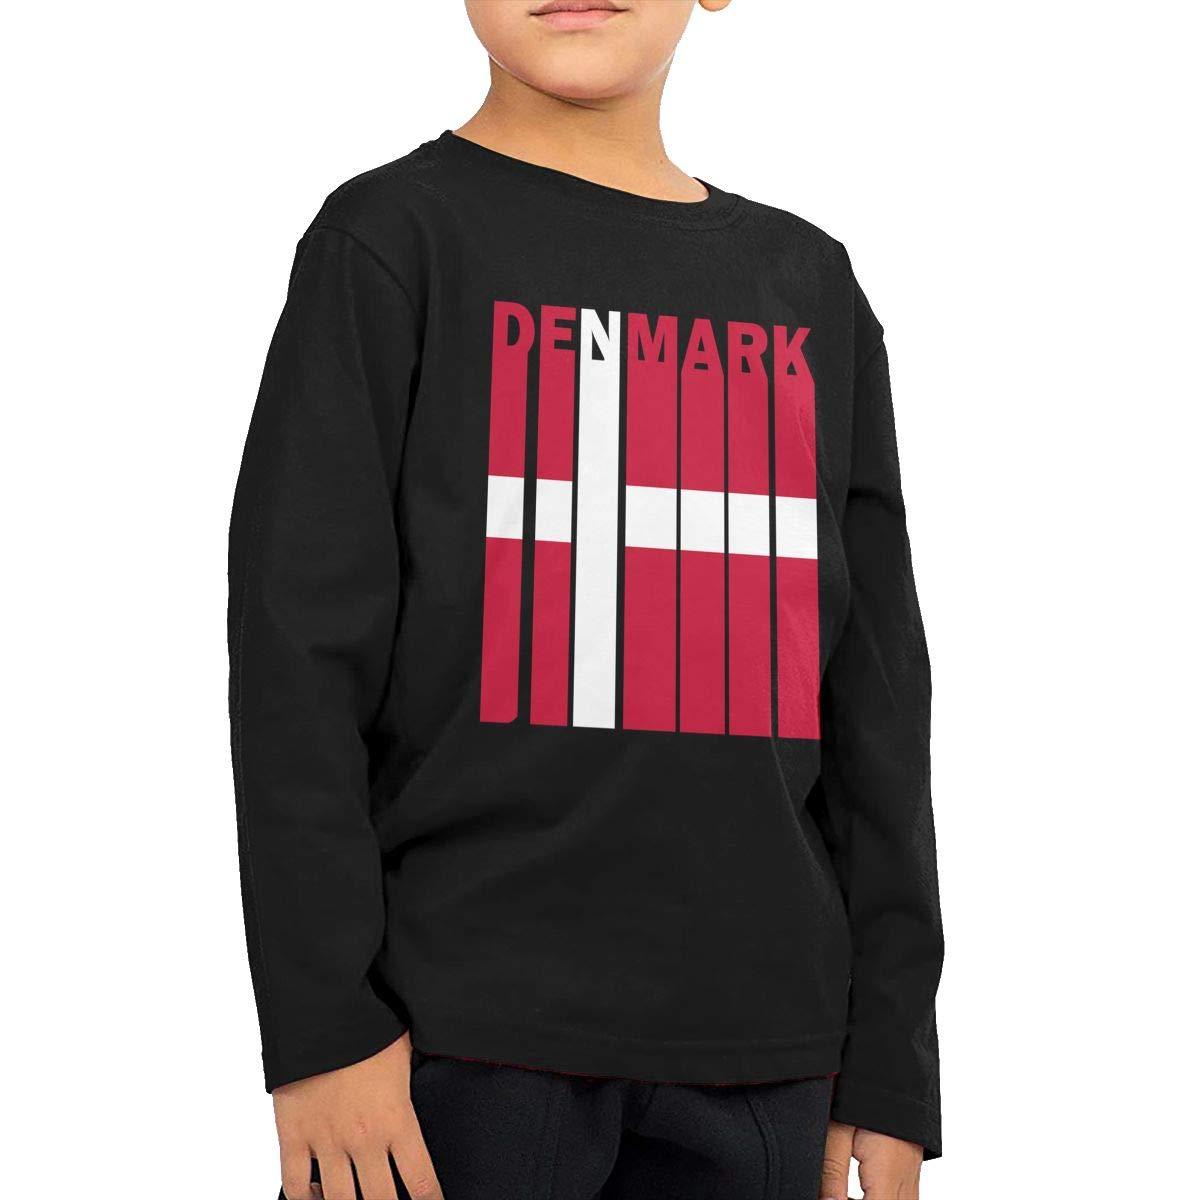 SHIRT1-KIDS Denmark Flag Word Toddler//Infant O-Neck Long Sleeve Shirt Tee Jersey for Toddlers